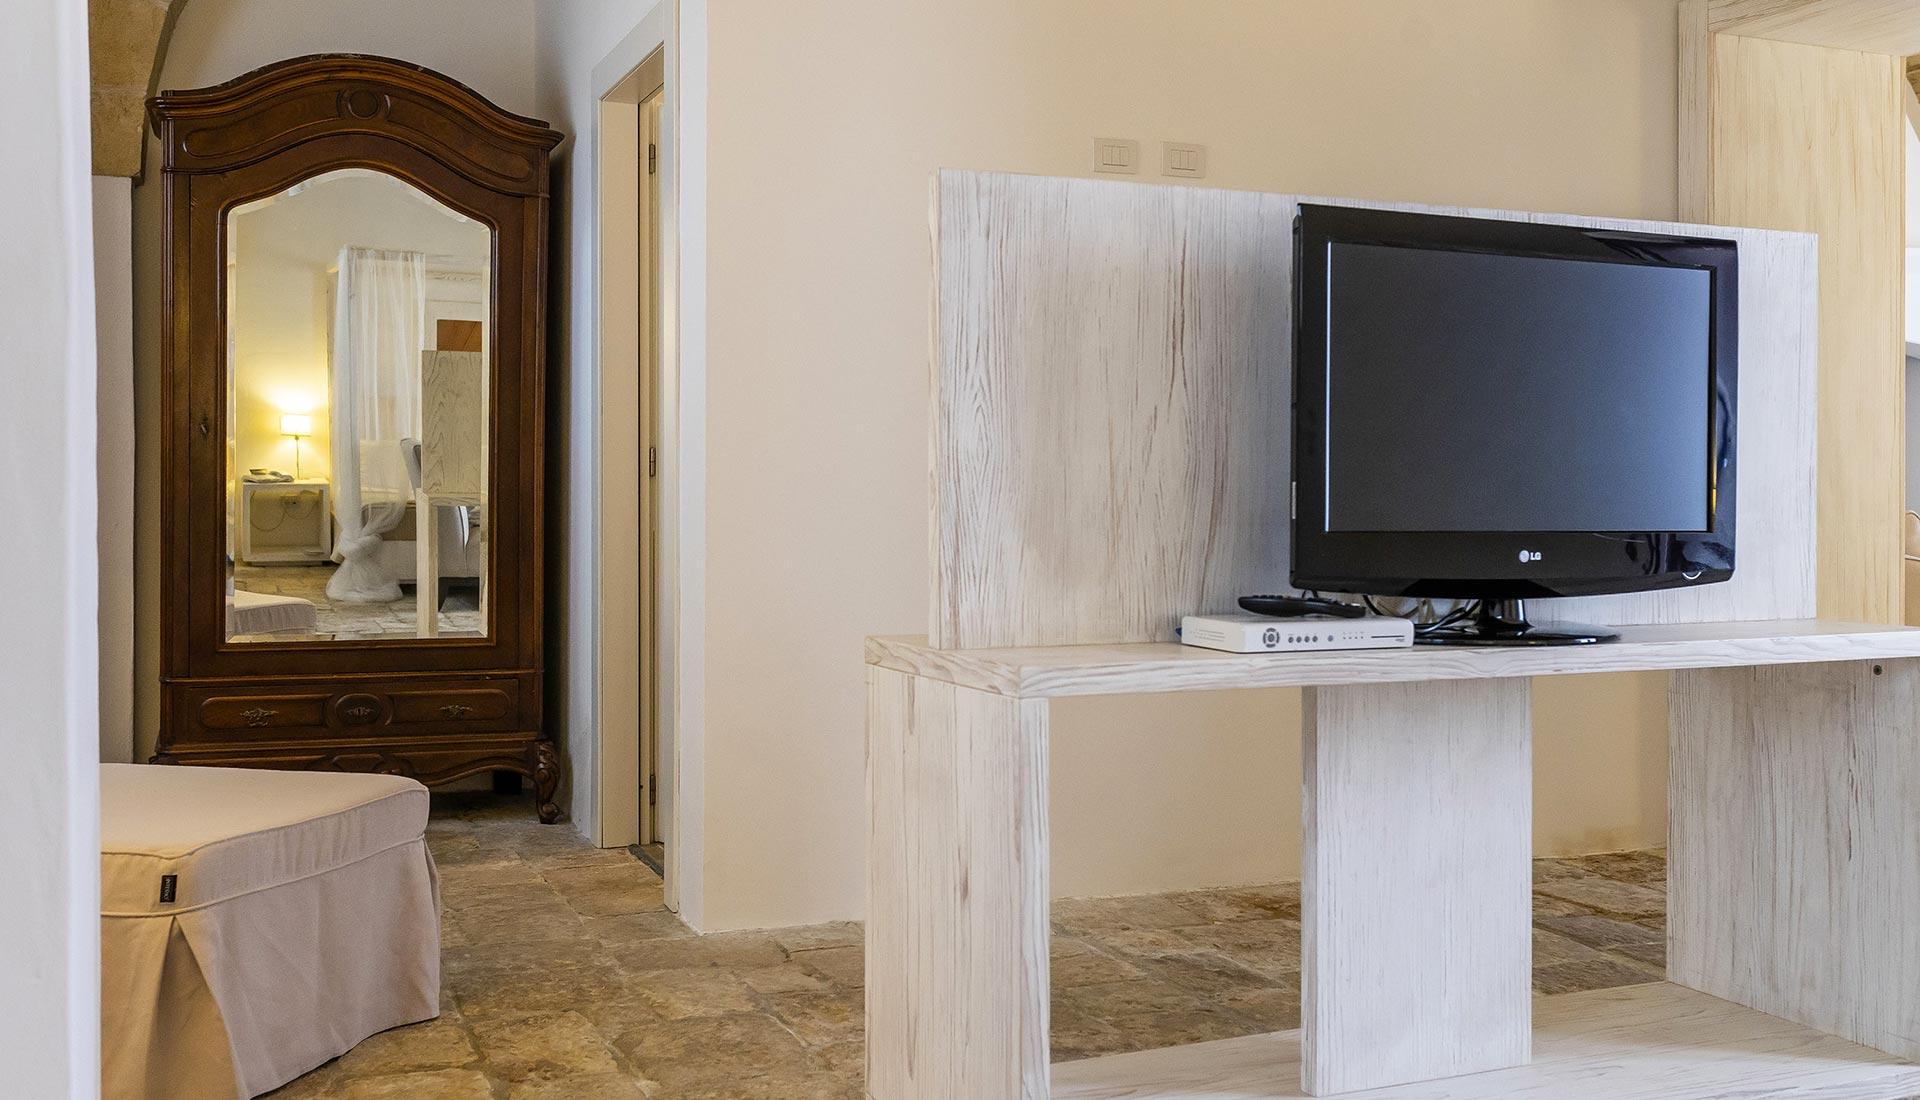 1_5_suite-conte-masseria-salento-02.jpg